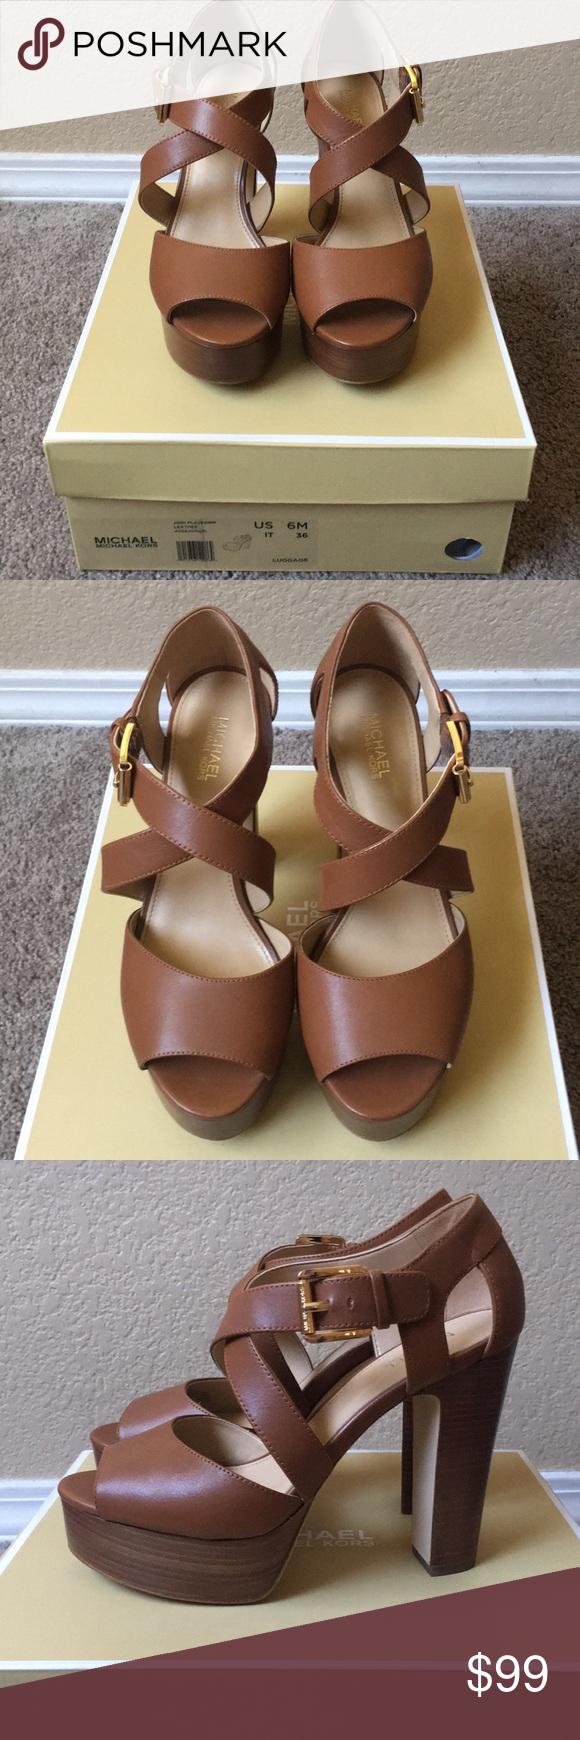 ee8a99eb84 Michael Kors Jodi Sandal Michael Kors Jodi leather Platform Sandal in  luggage. Worn only 2